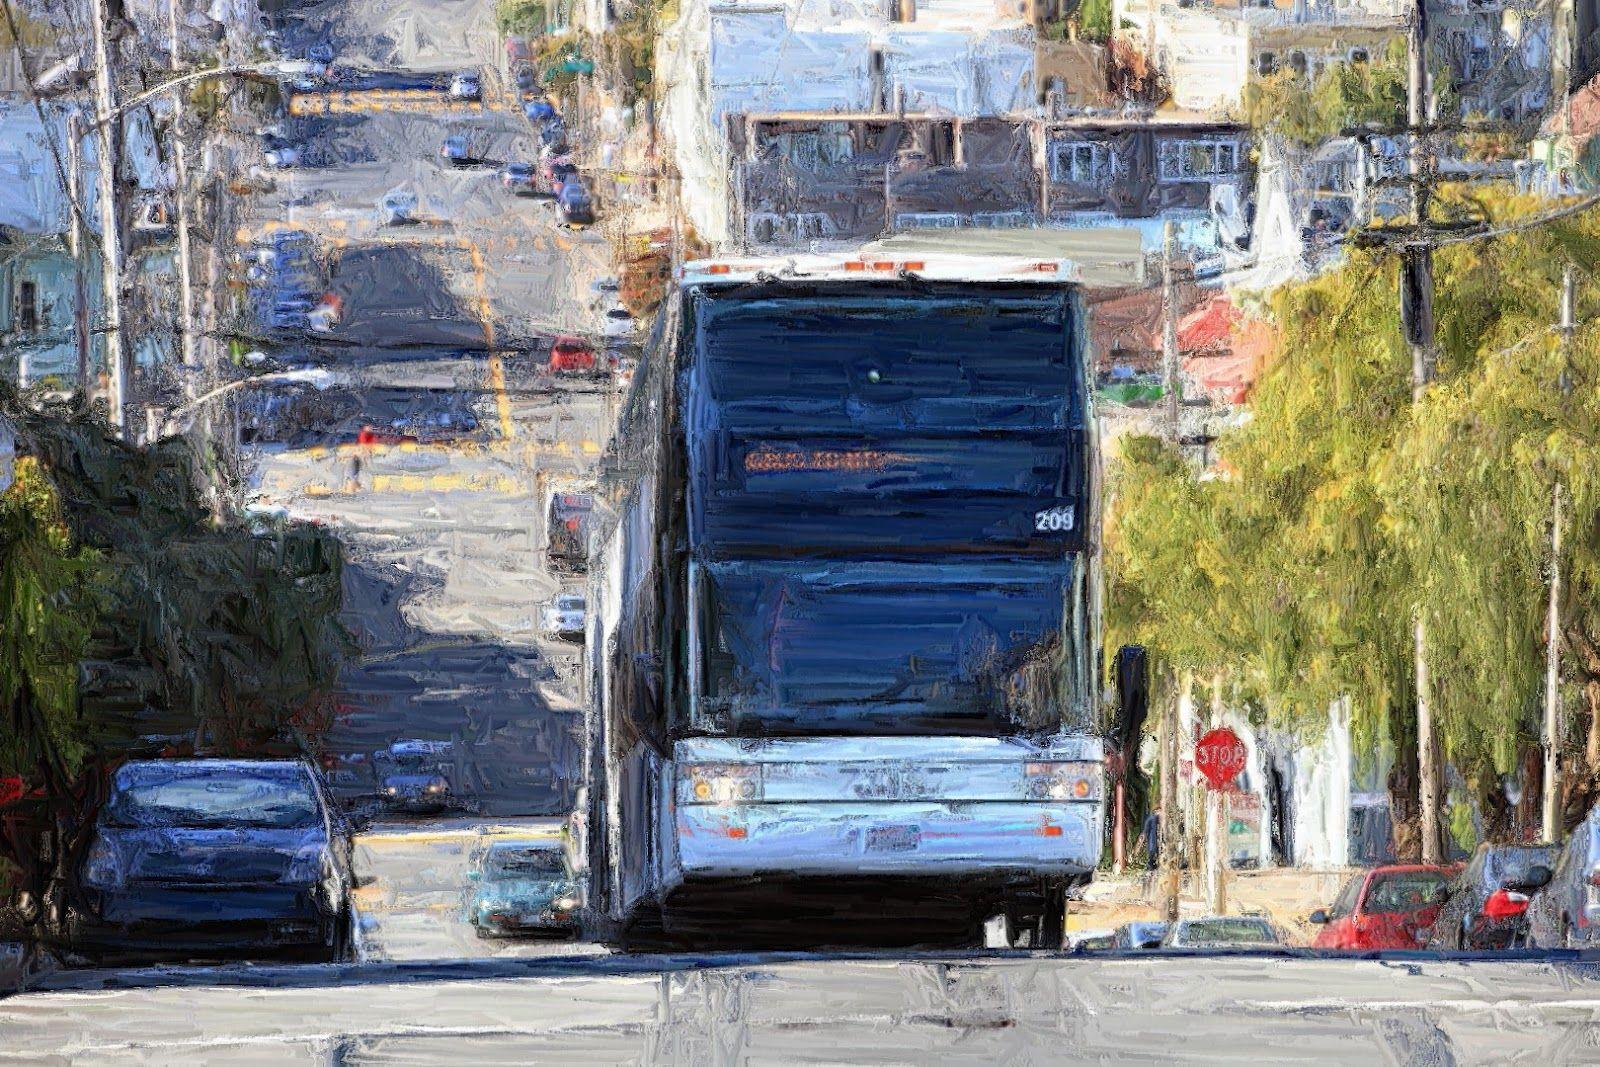 Wayne Thiebaud Painting Of Bus Potrero Hill In San Francisco Transportation